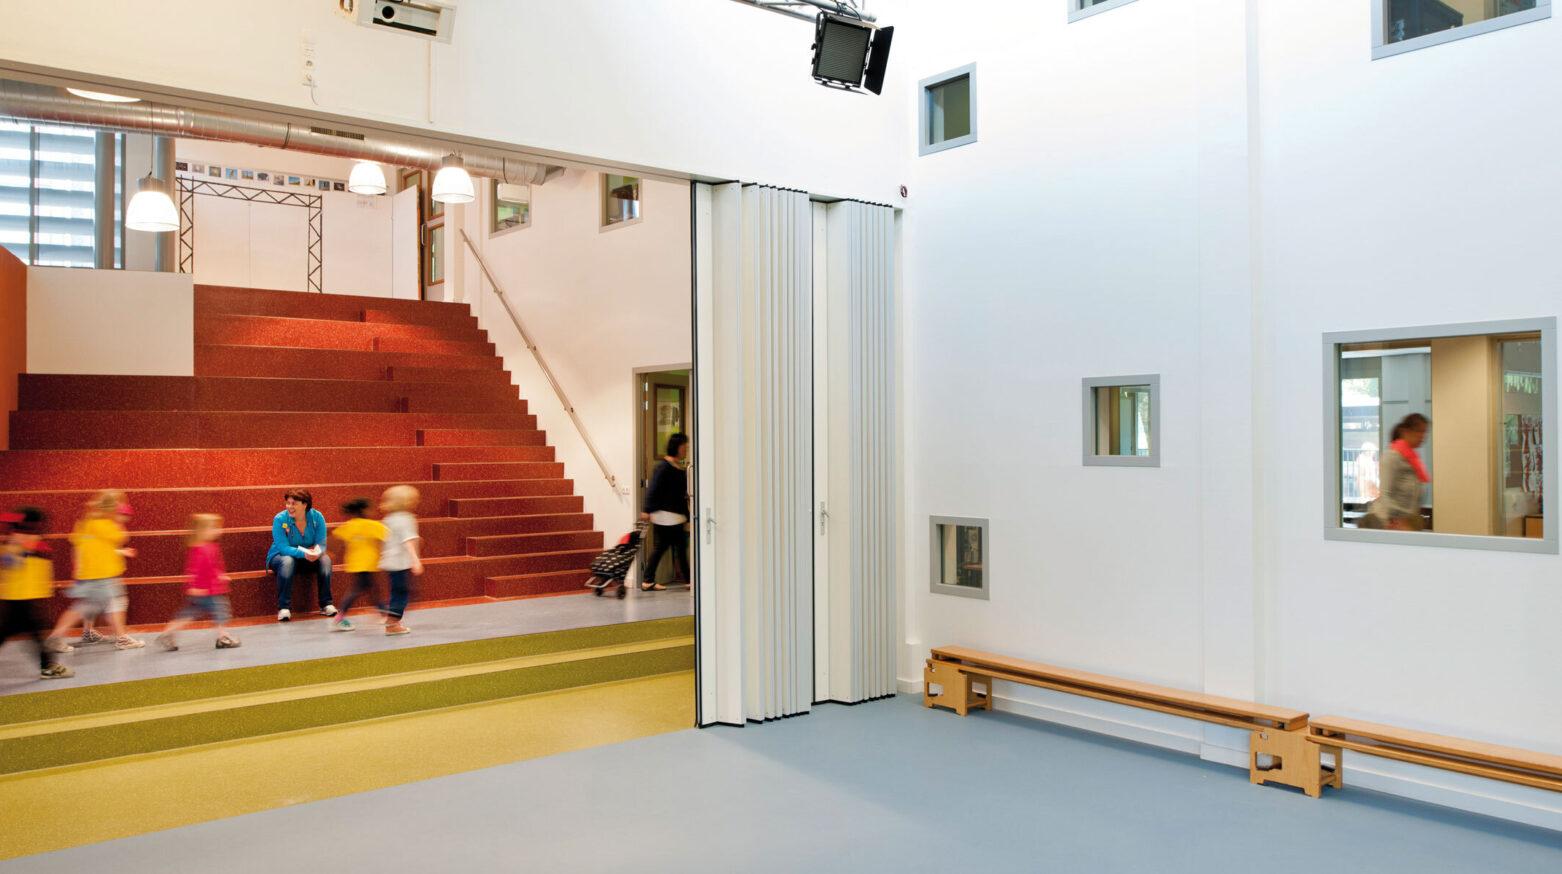 Kindcentrum oirschot trap met kids3